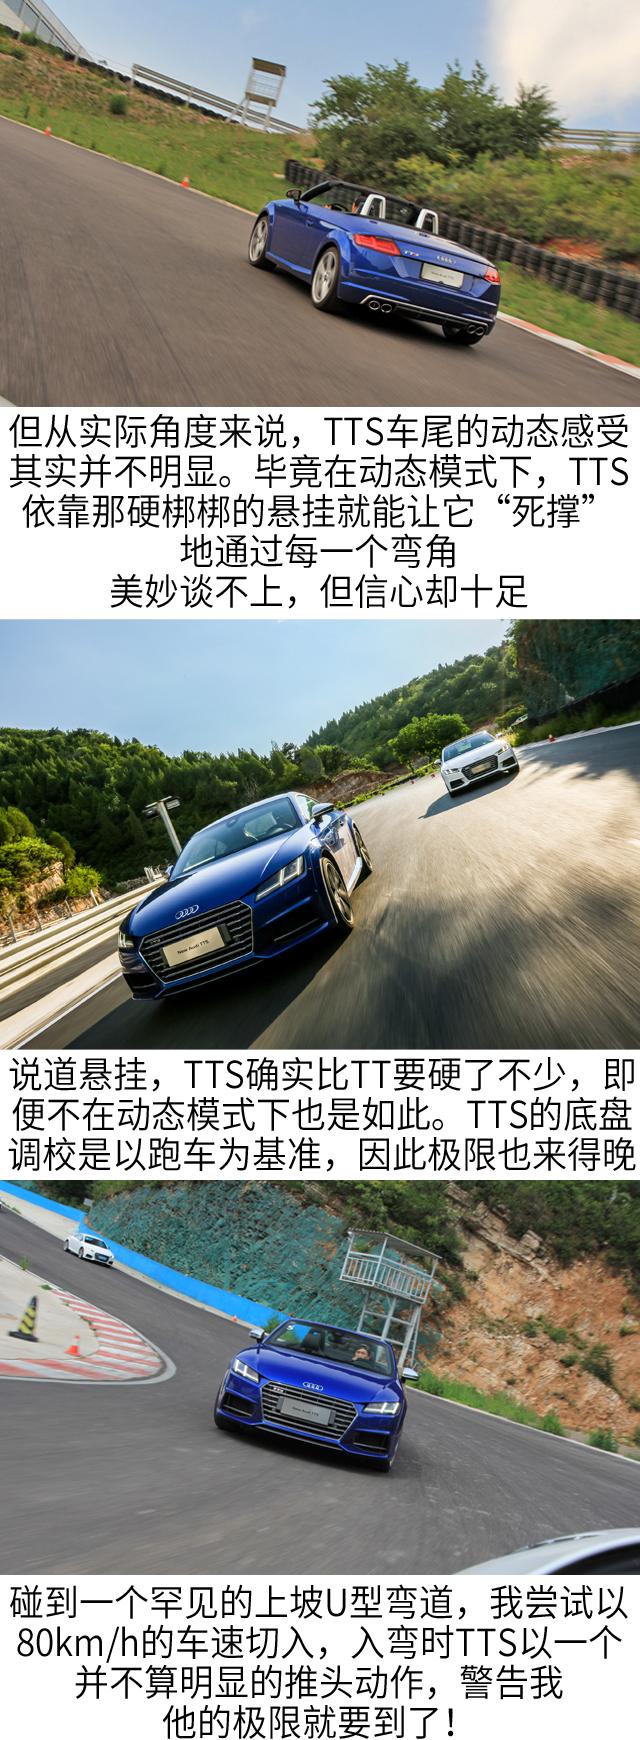 MR TRY|同价位叫板M2? 奥迪TTS嗨谷亮剑7